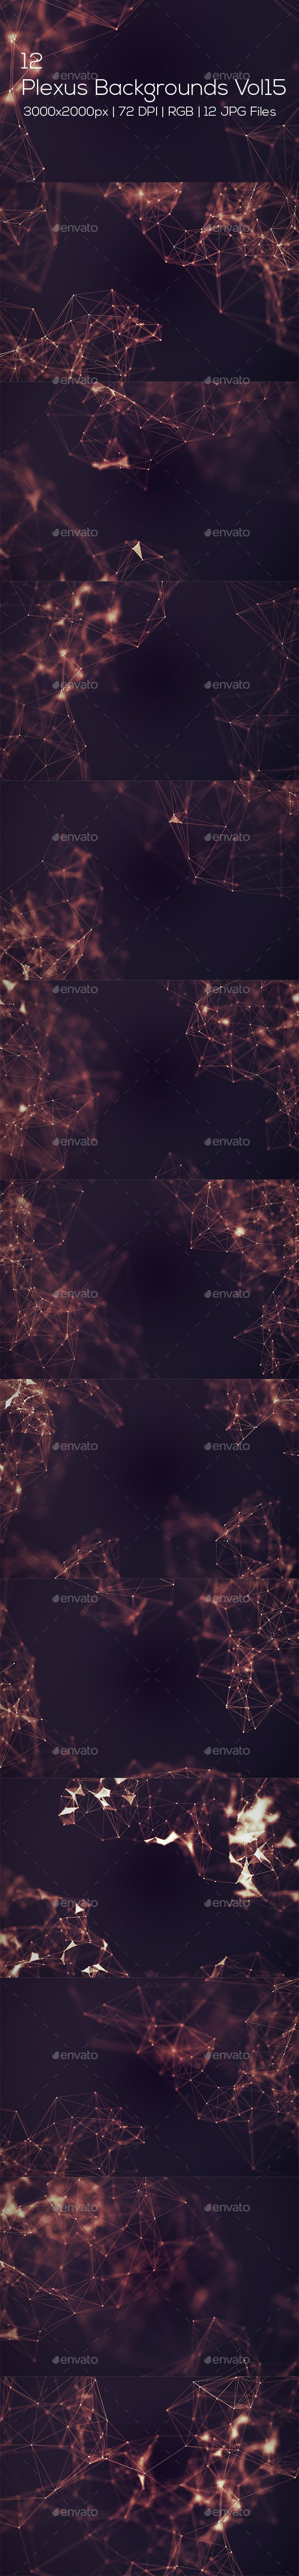 Plexus Backgrounds Vol15 - Abstract Backgrounds